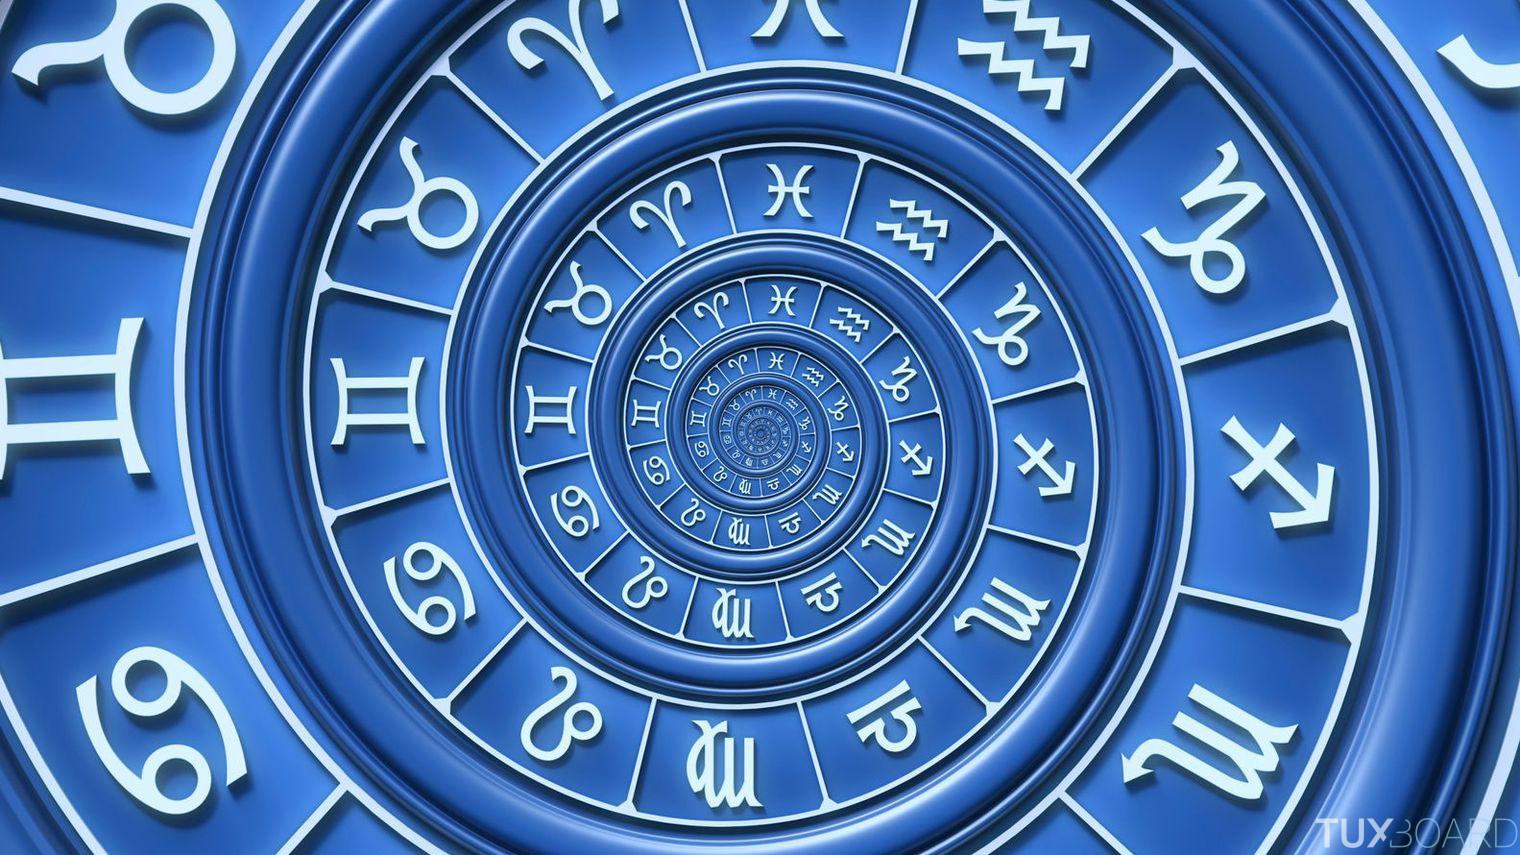 imagessignes-astrologiques-19.jpg